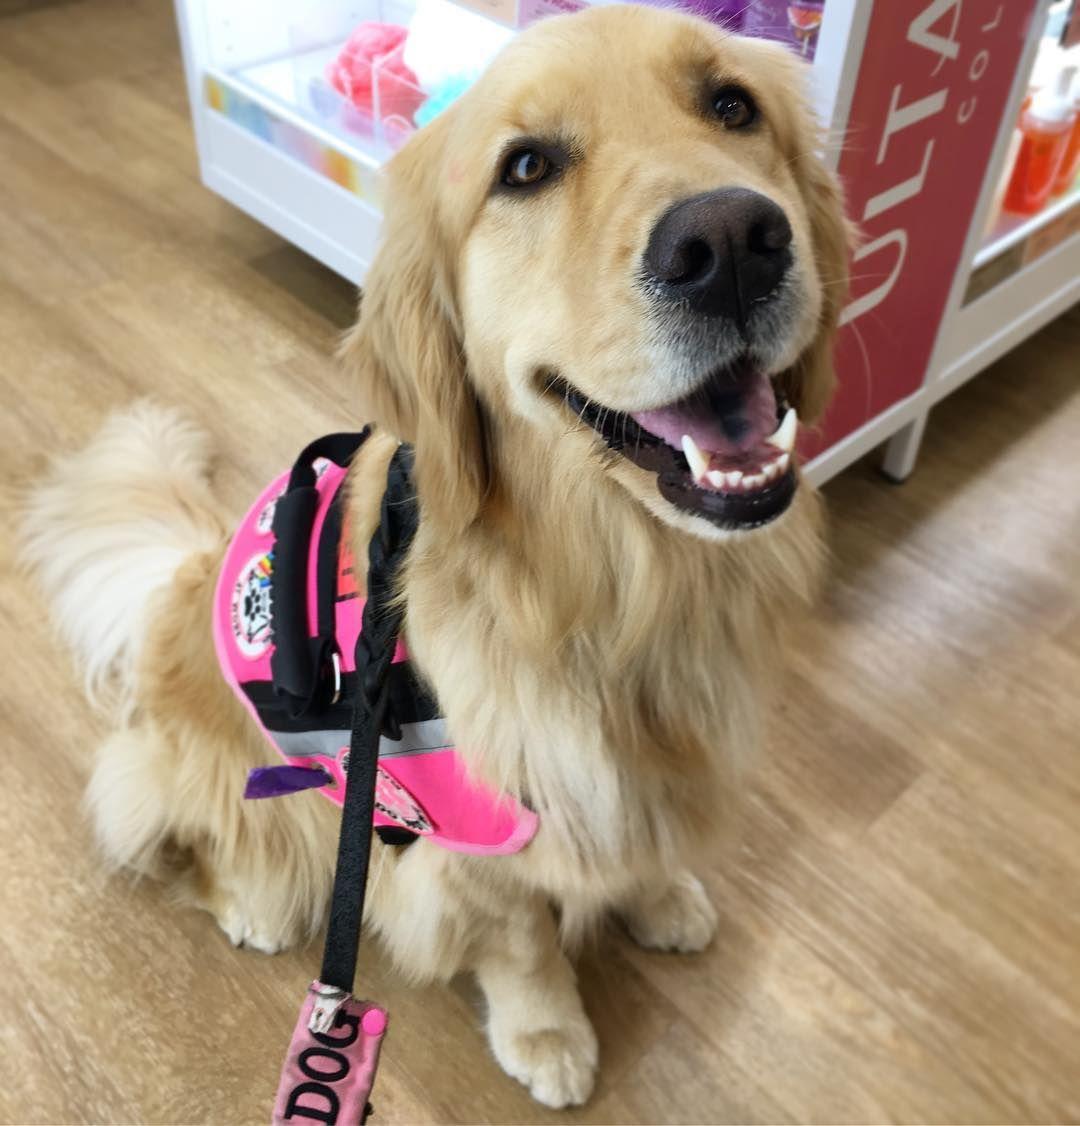 Percie the Service Dog, service dog, pink vest, golden